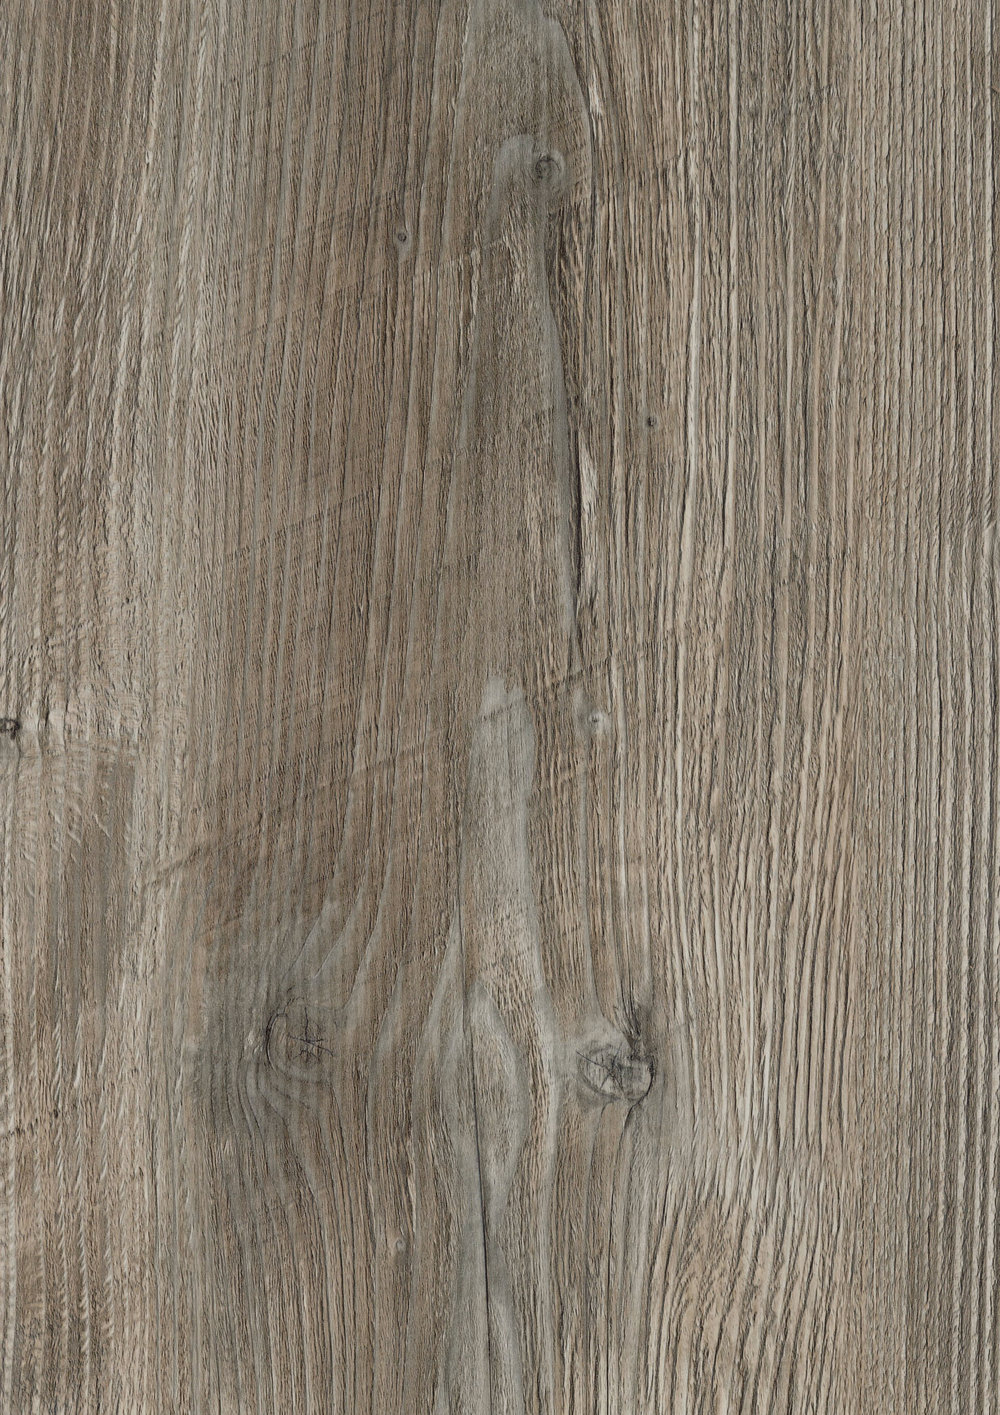 Ponderosa Pine R55004 RU